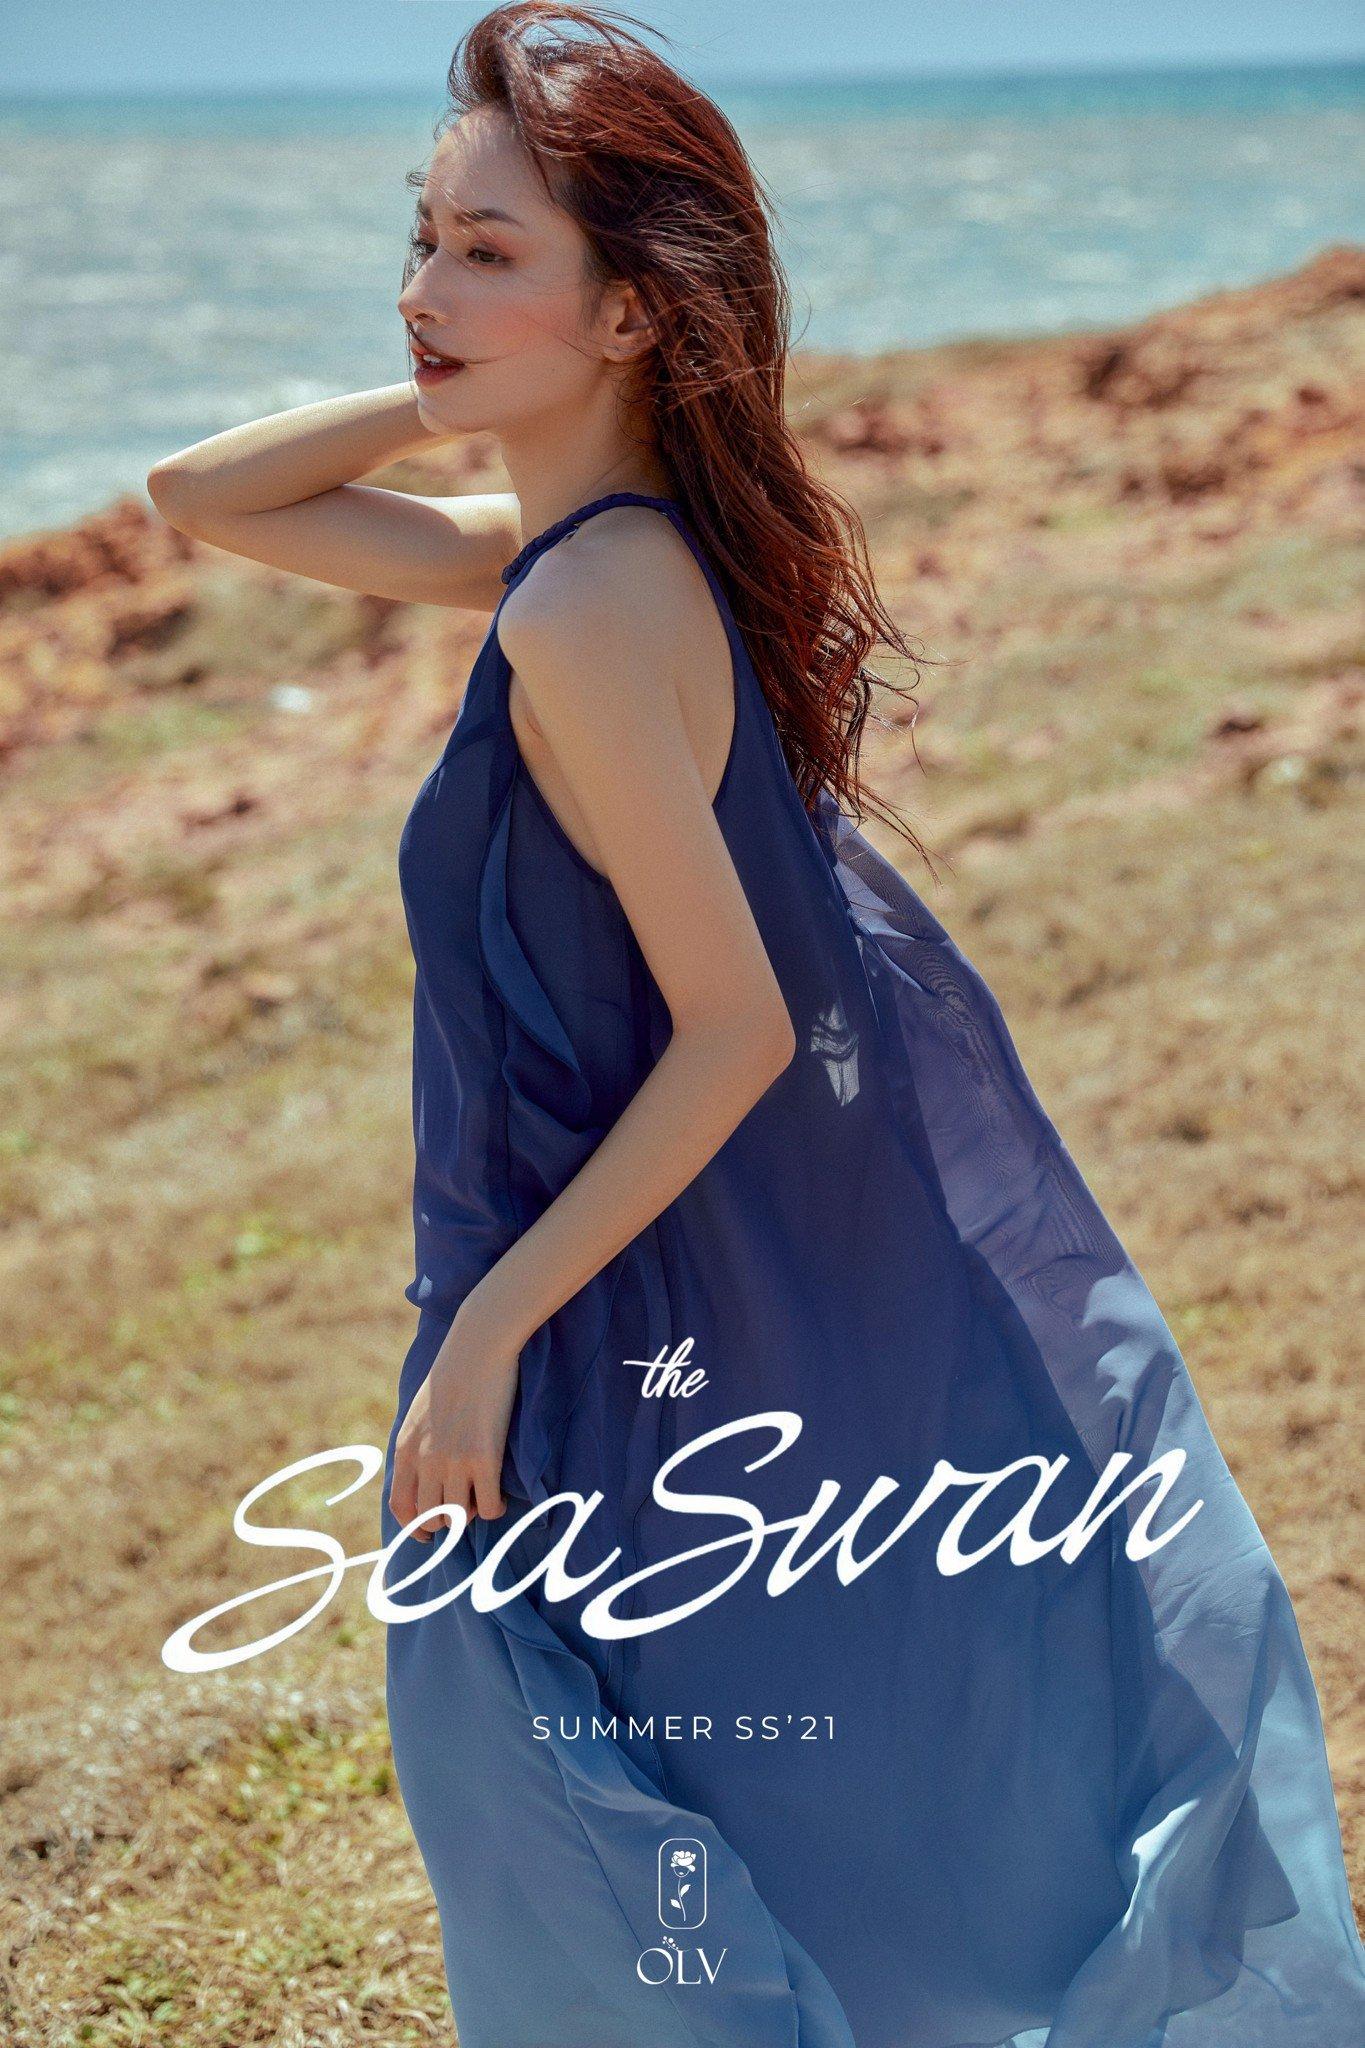 olv the sea swan